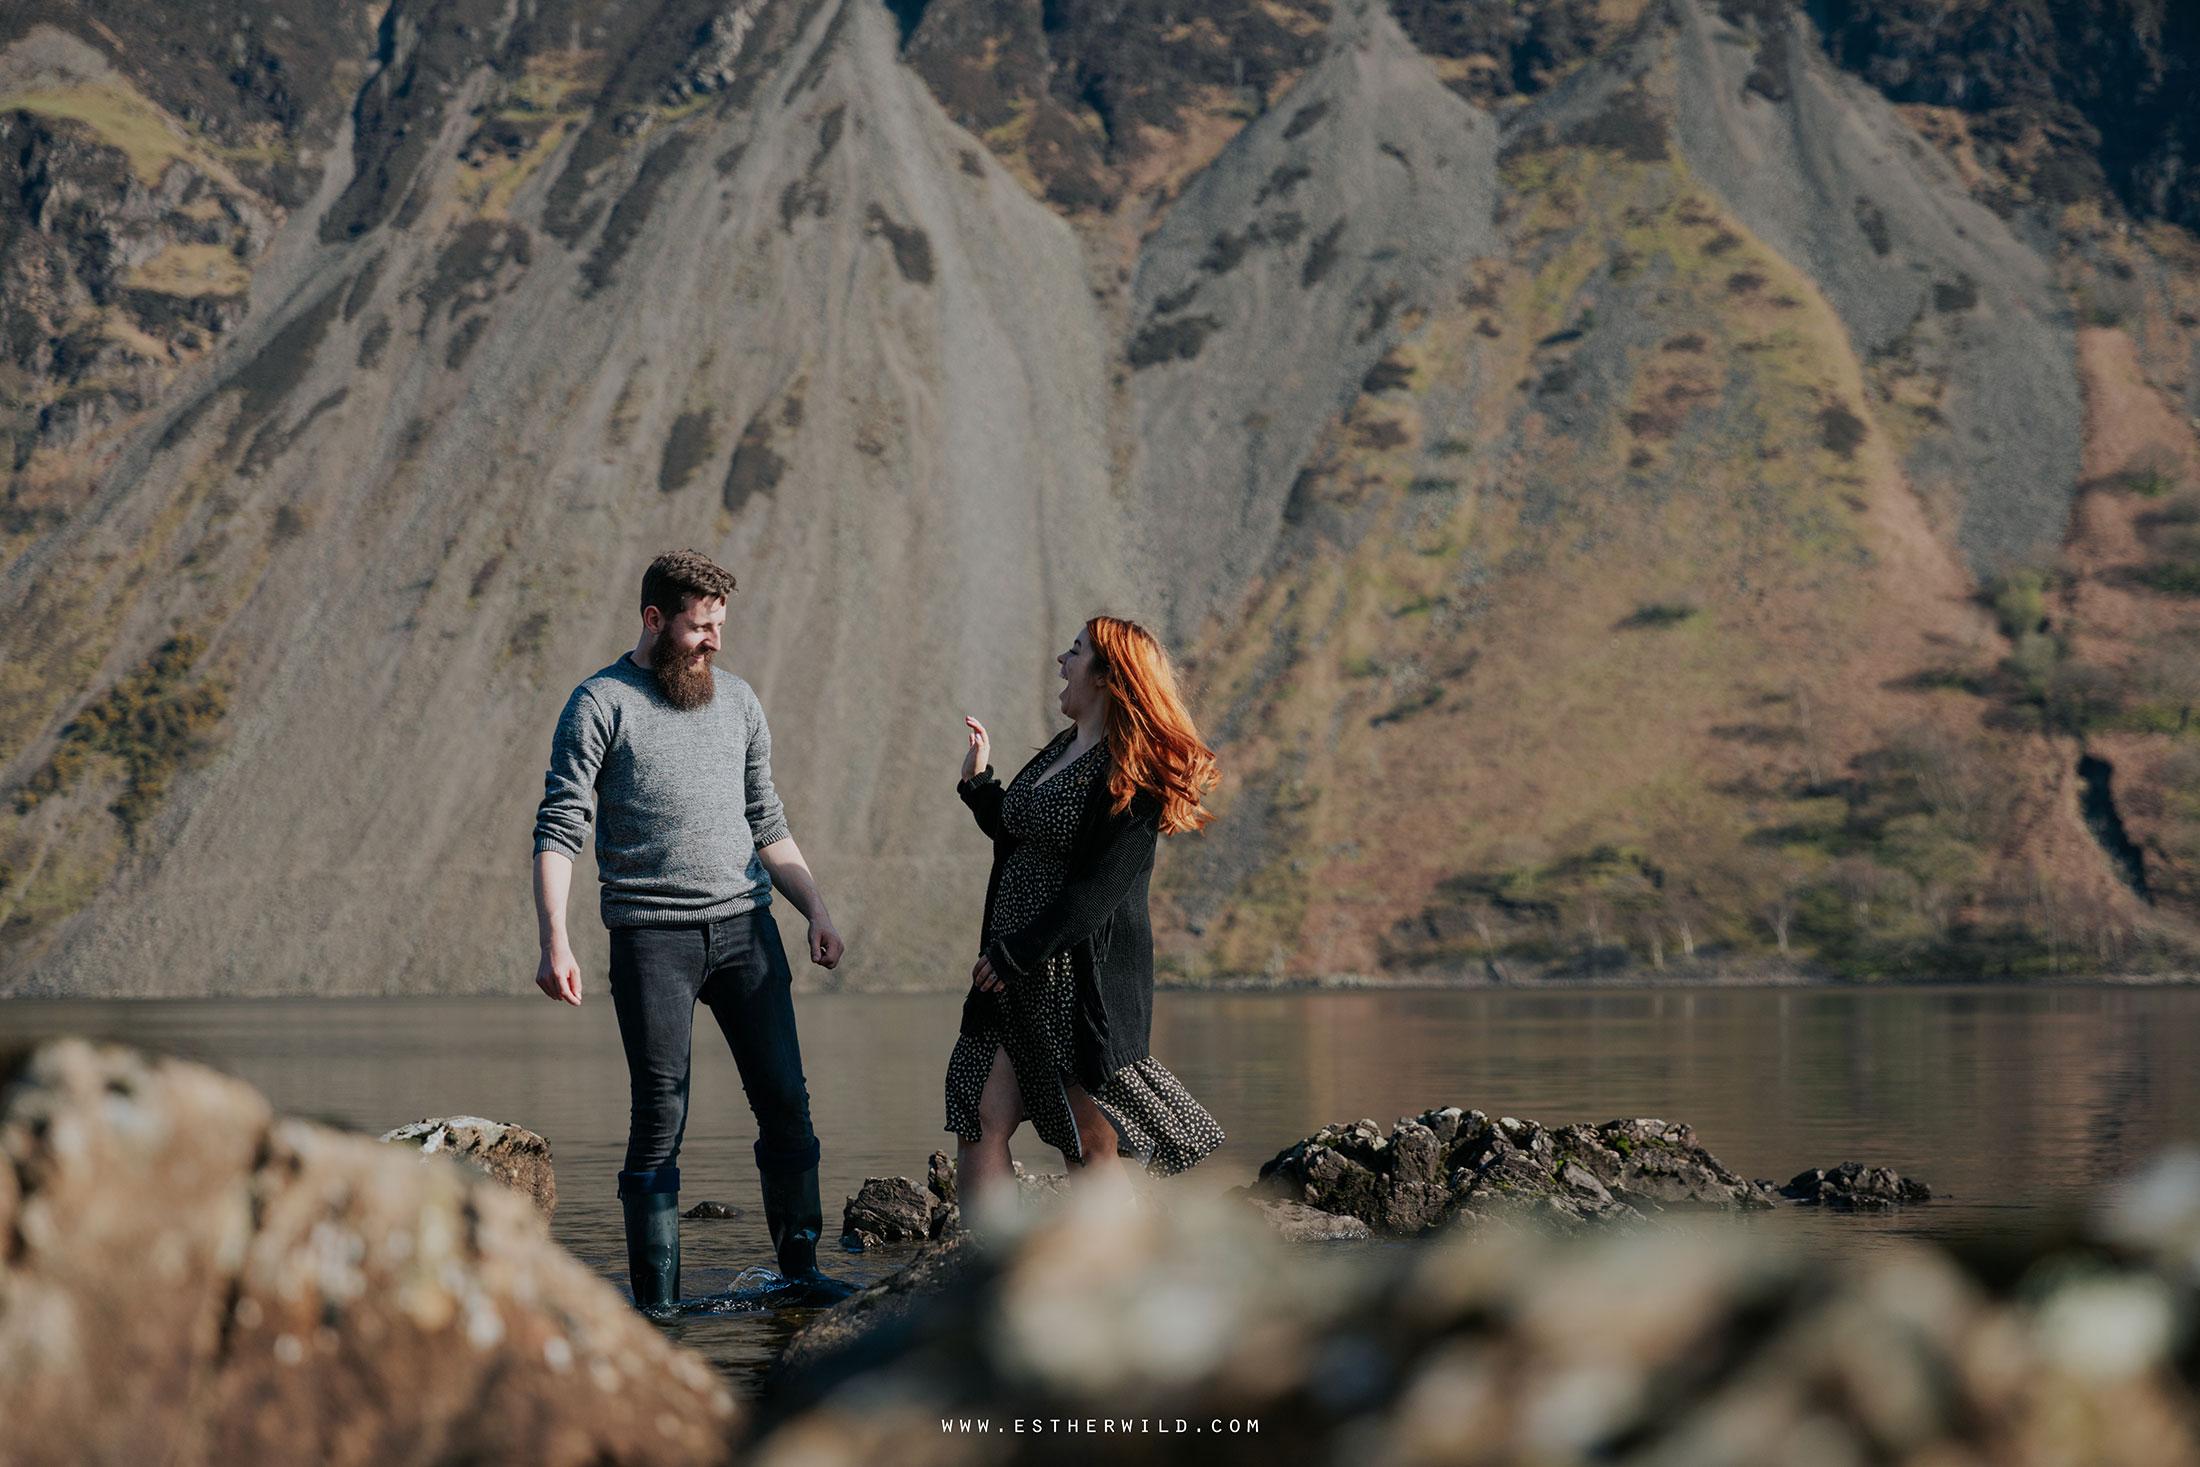 Cumbria_Lake_District_Wasdale_Wedding_Photographer_Destination_Engagement_Anniversary_Esther_Wild_IMG_3287.jpg